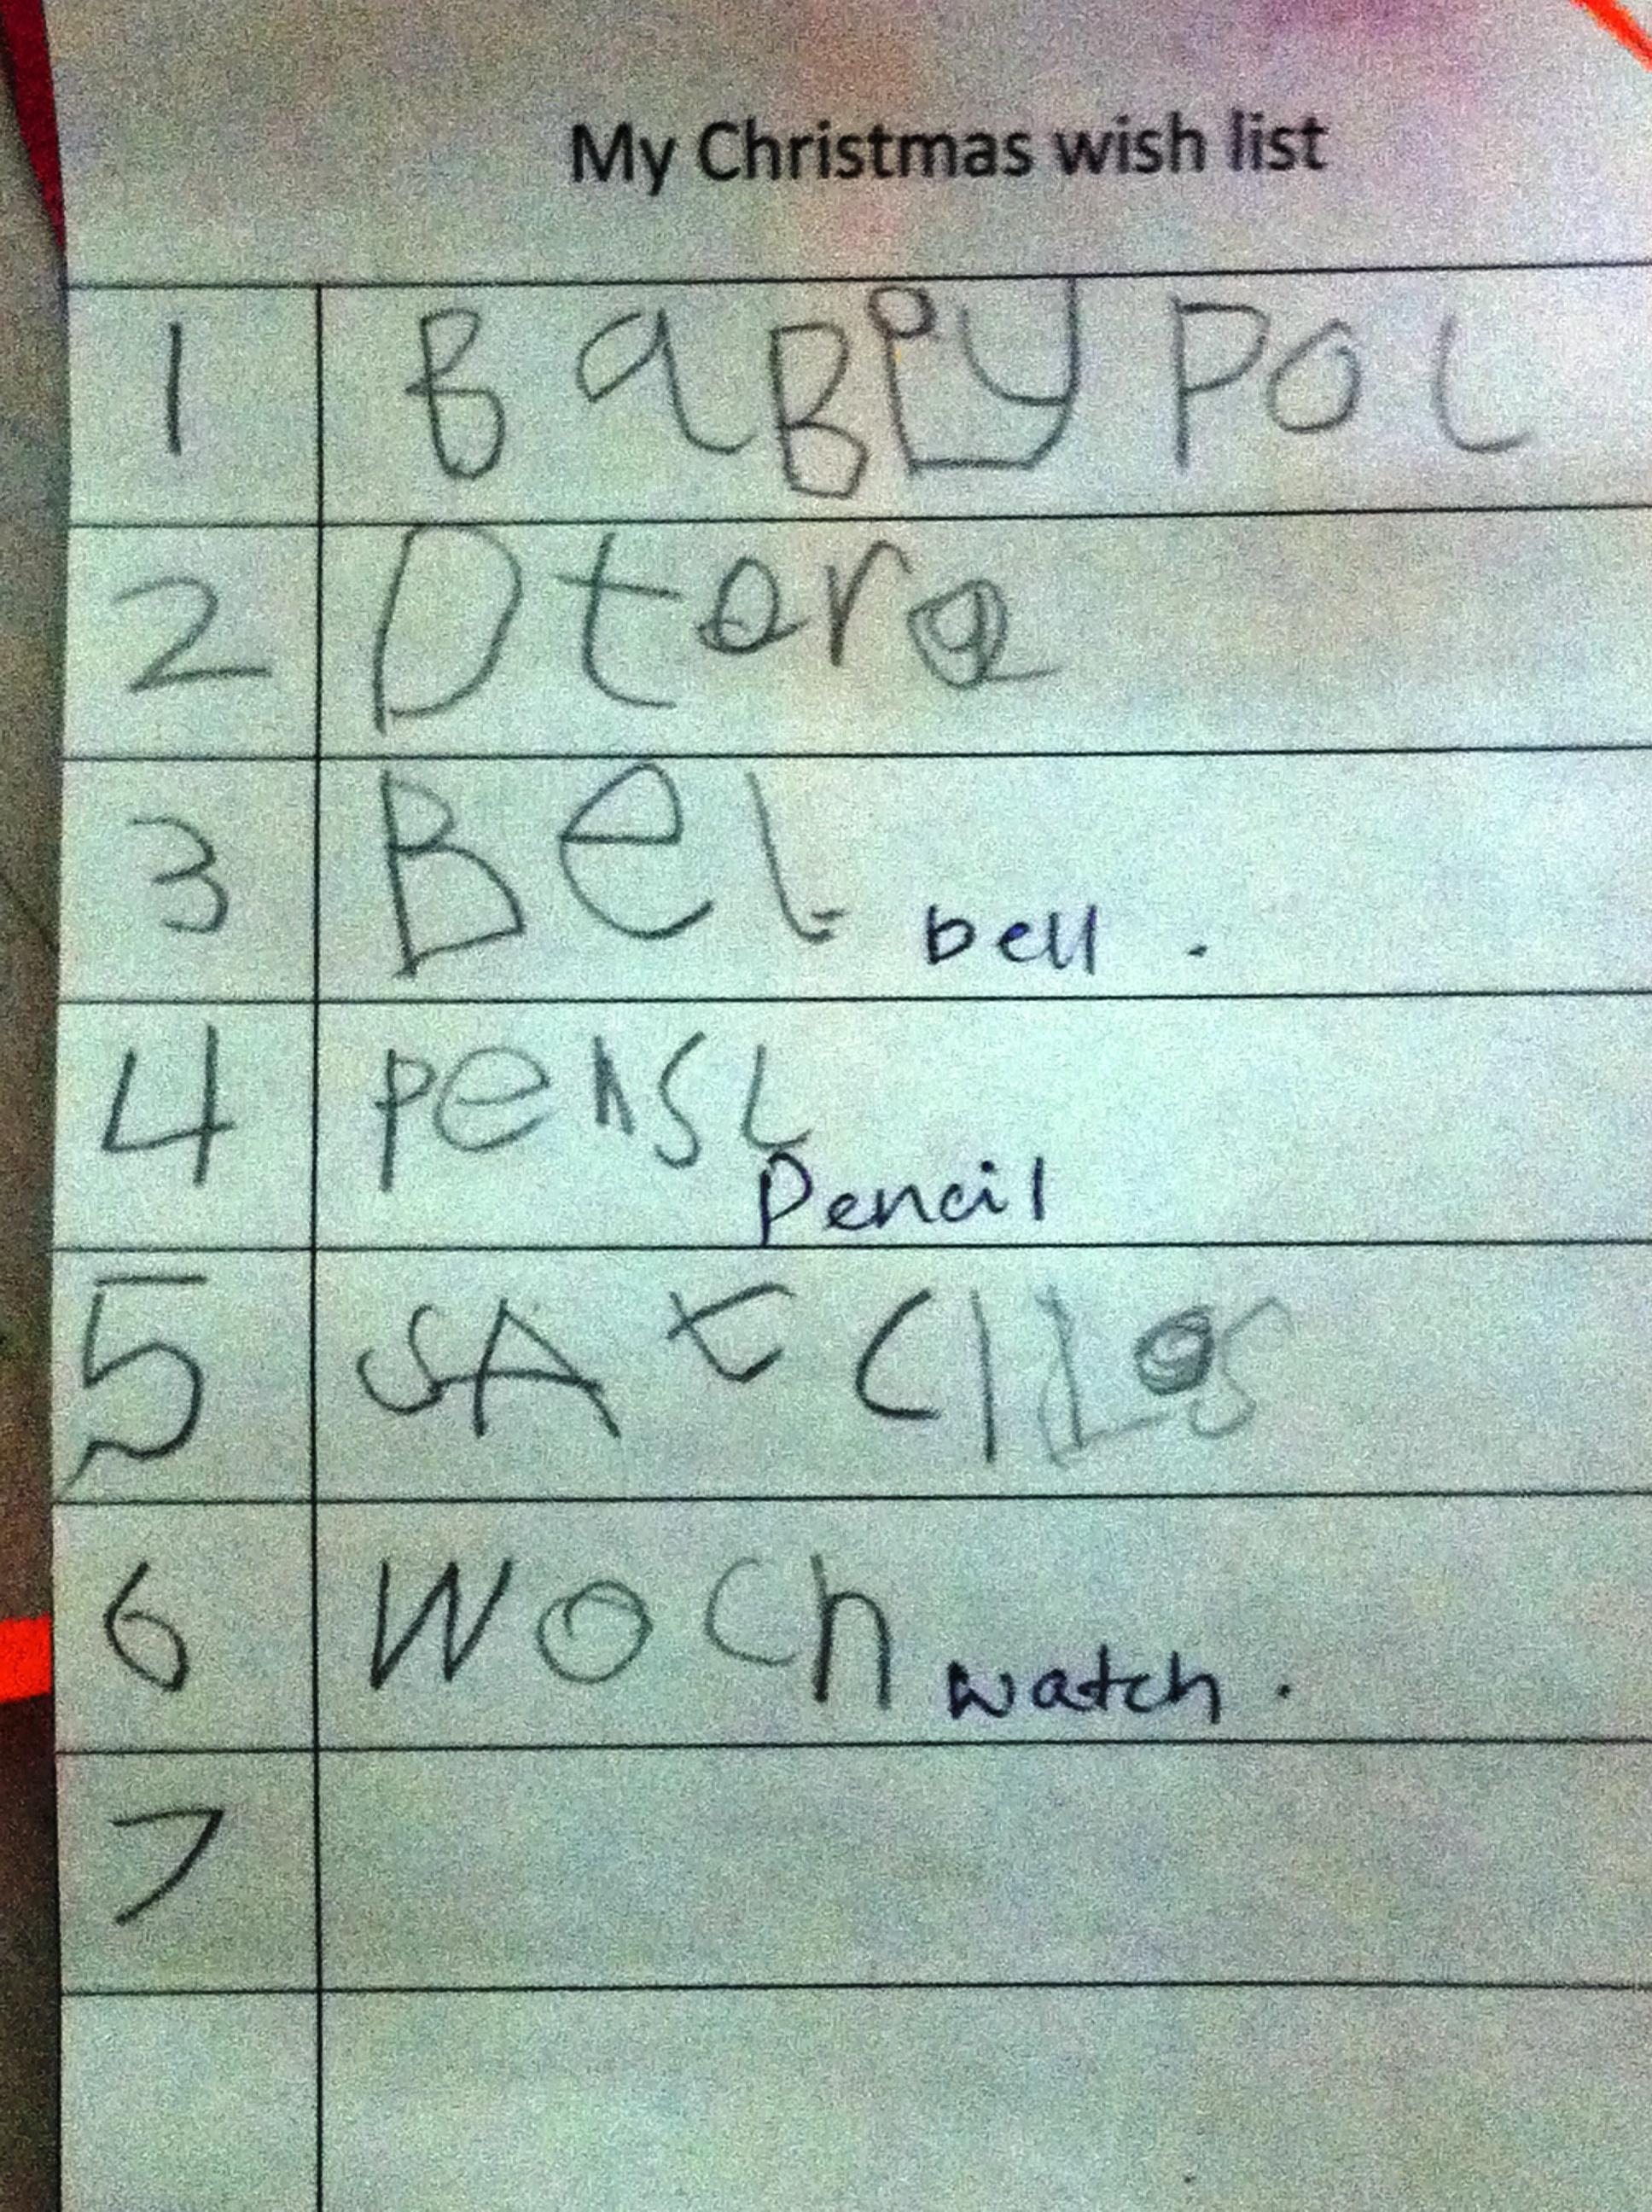 A close-up, excuse the typos... 1=Barbie doll, 2=Dora, 5=Santa Claus